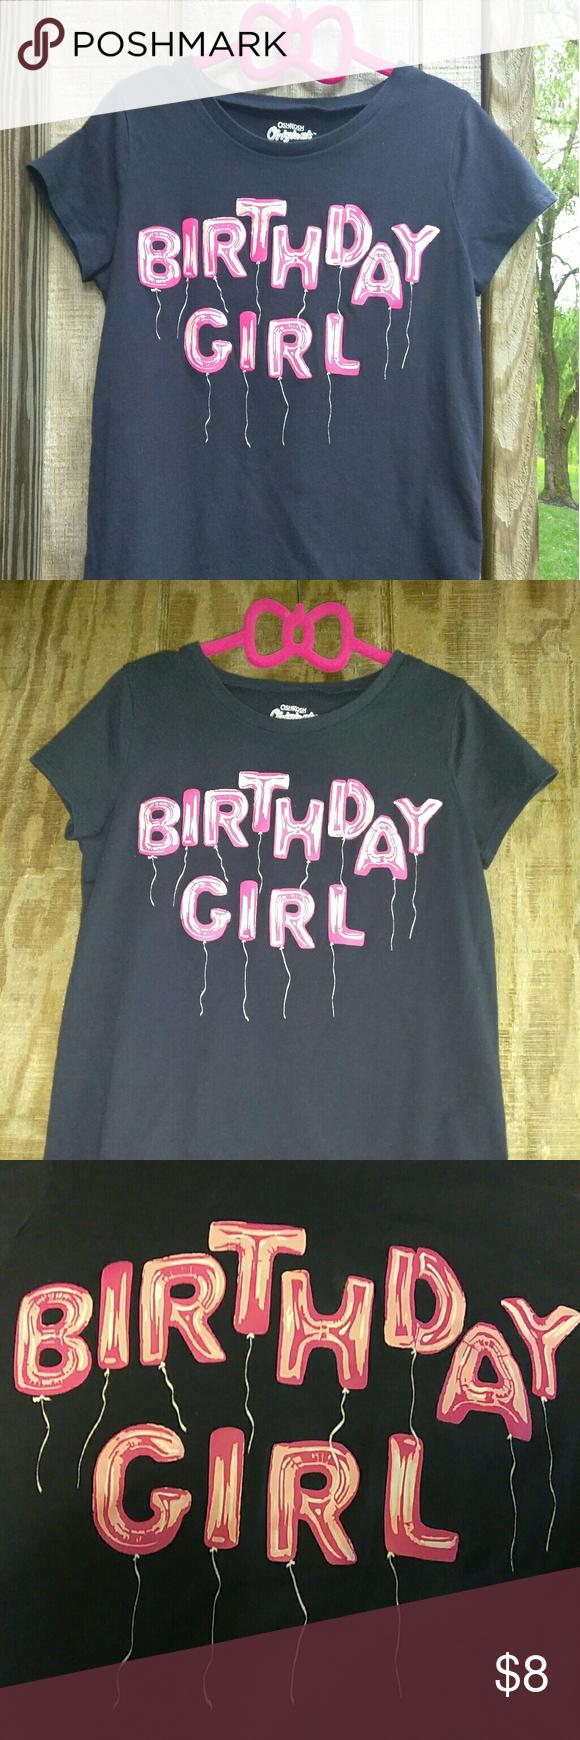 Girls T Shirt OshKosh Bgosh BIRTHDAY GIRL Tee 100 Cotton Free Shirts Tops Tees